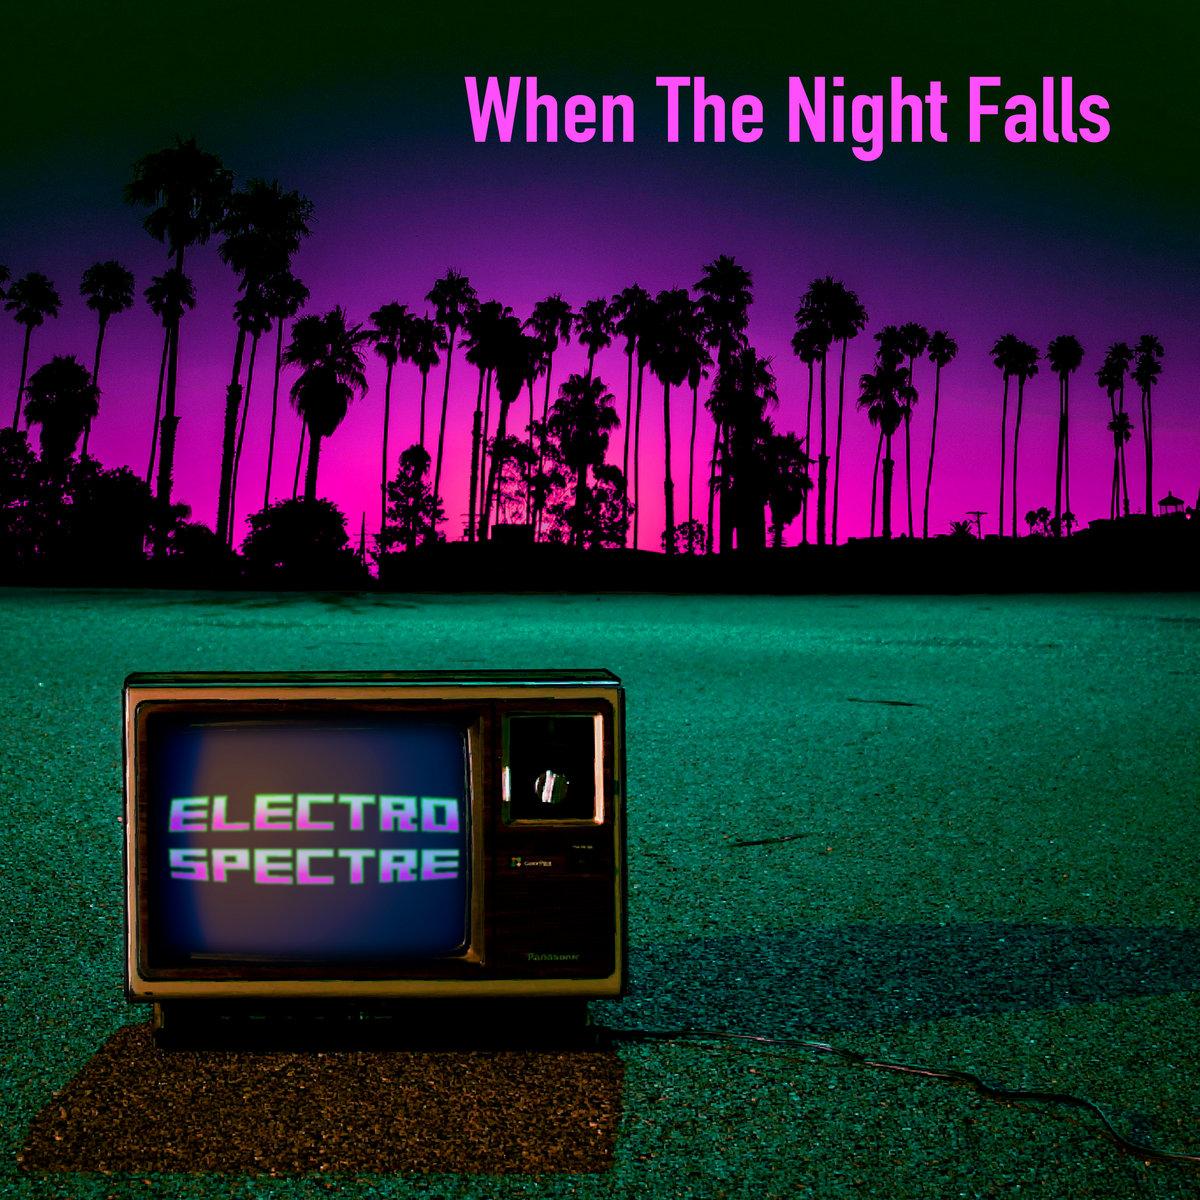 Electro News @ – Electro Spectre- When the night fall EP